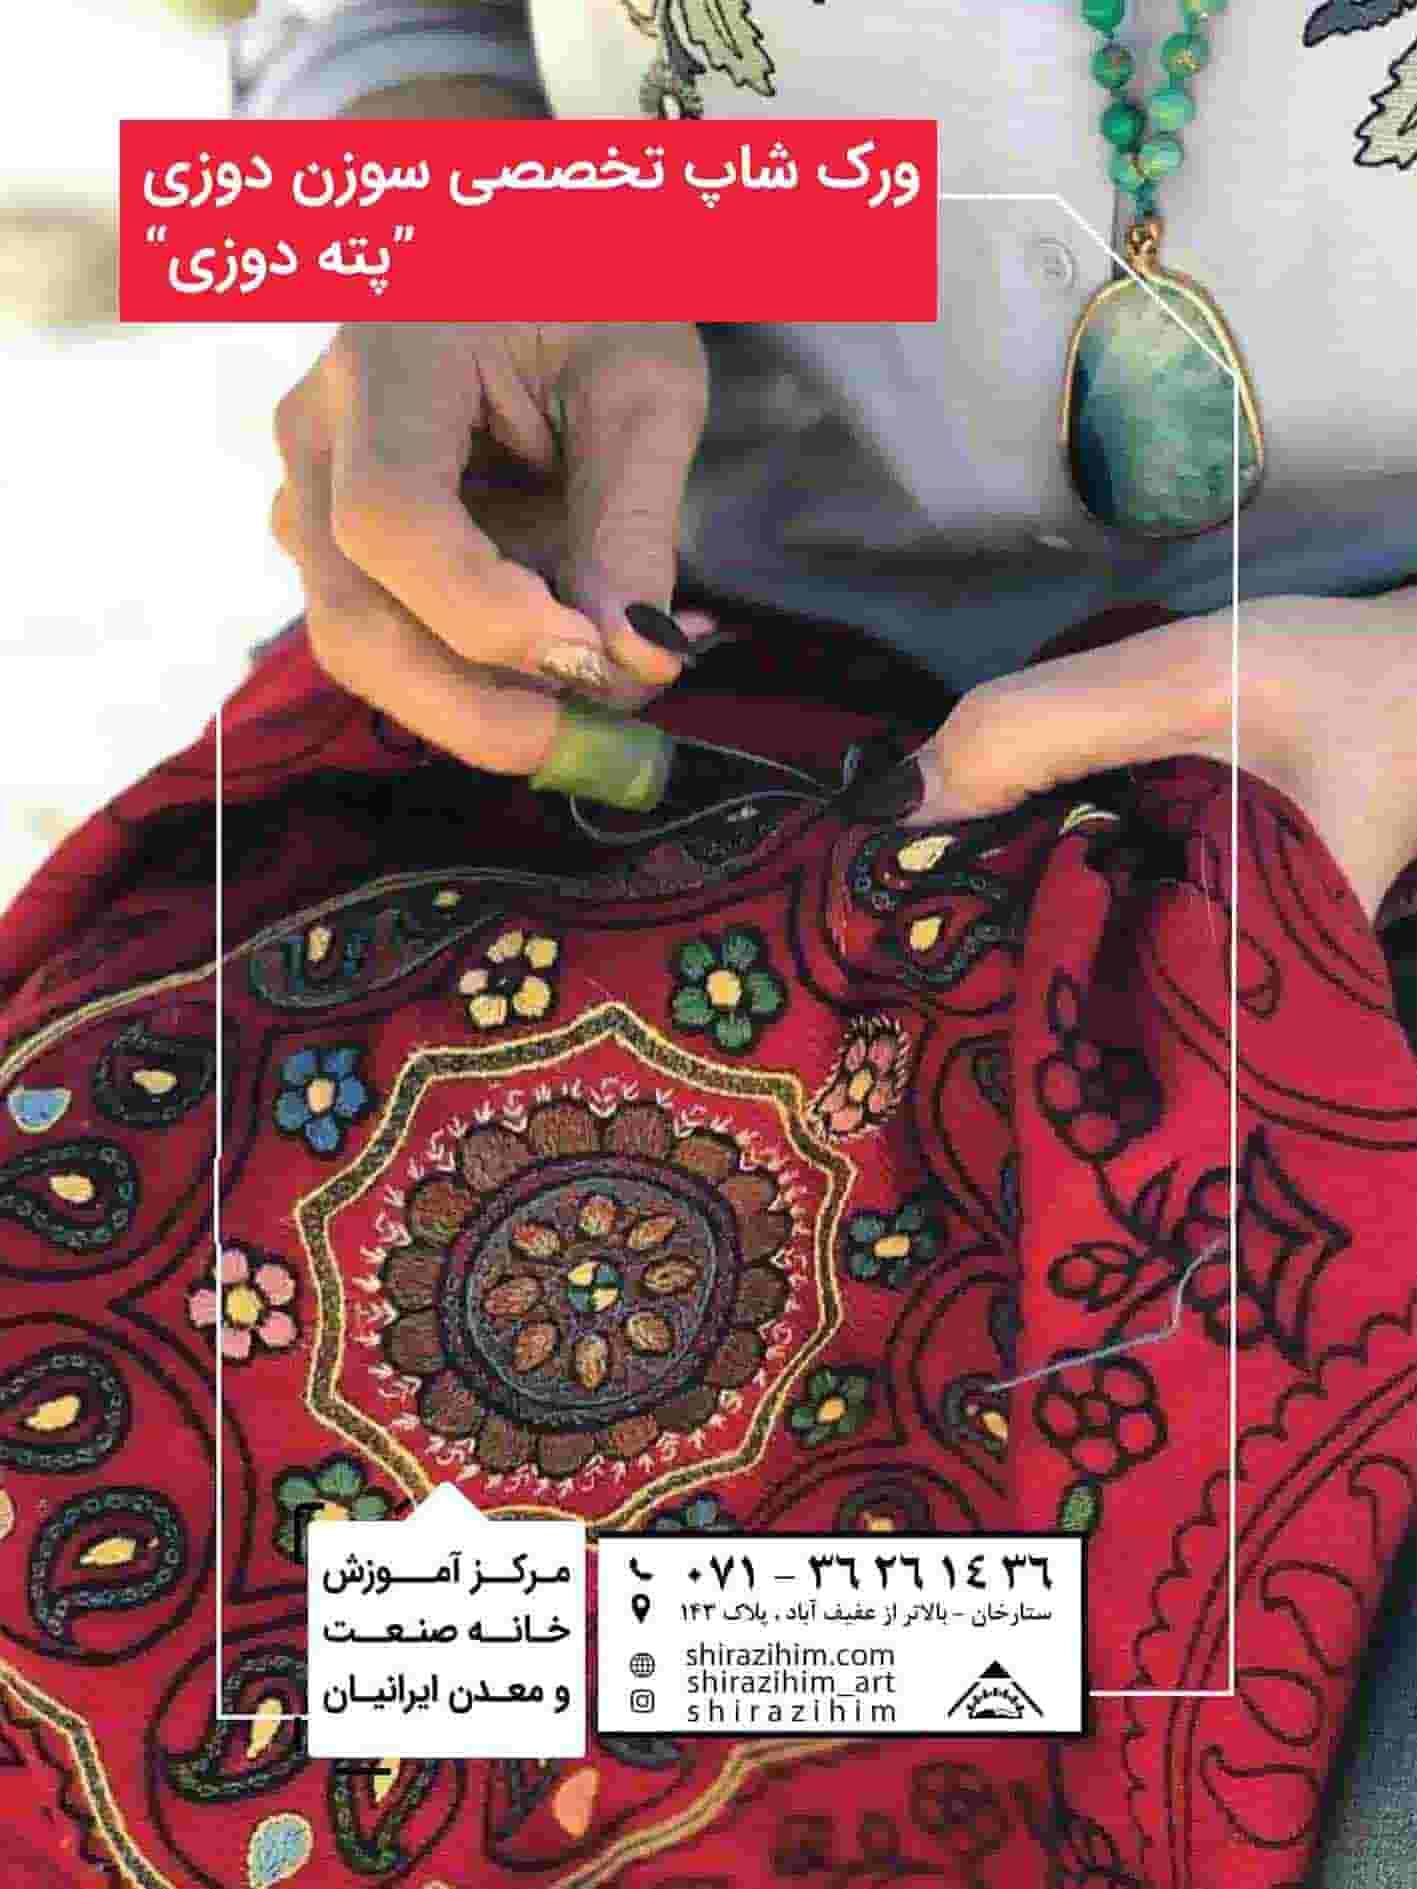 min - آموزش پته دوزی در شیراز